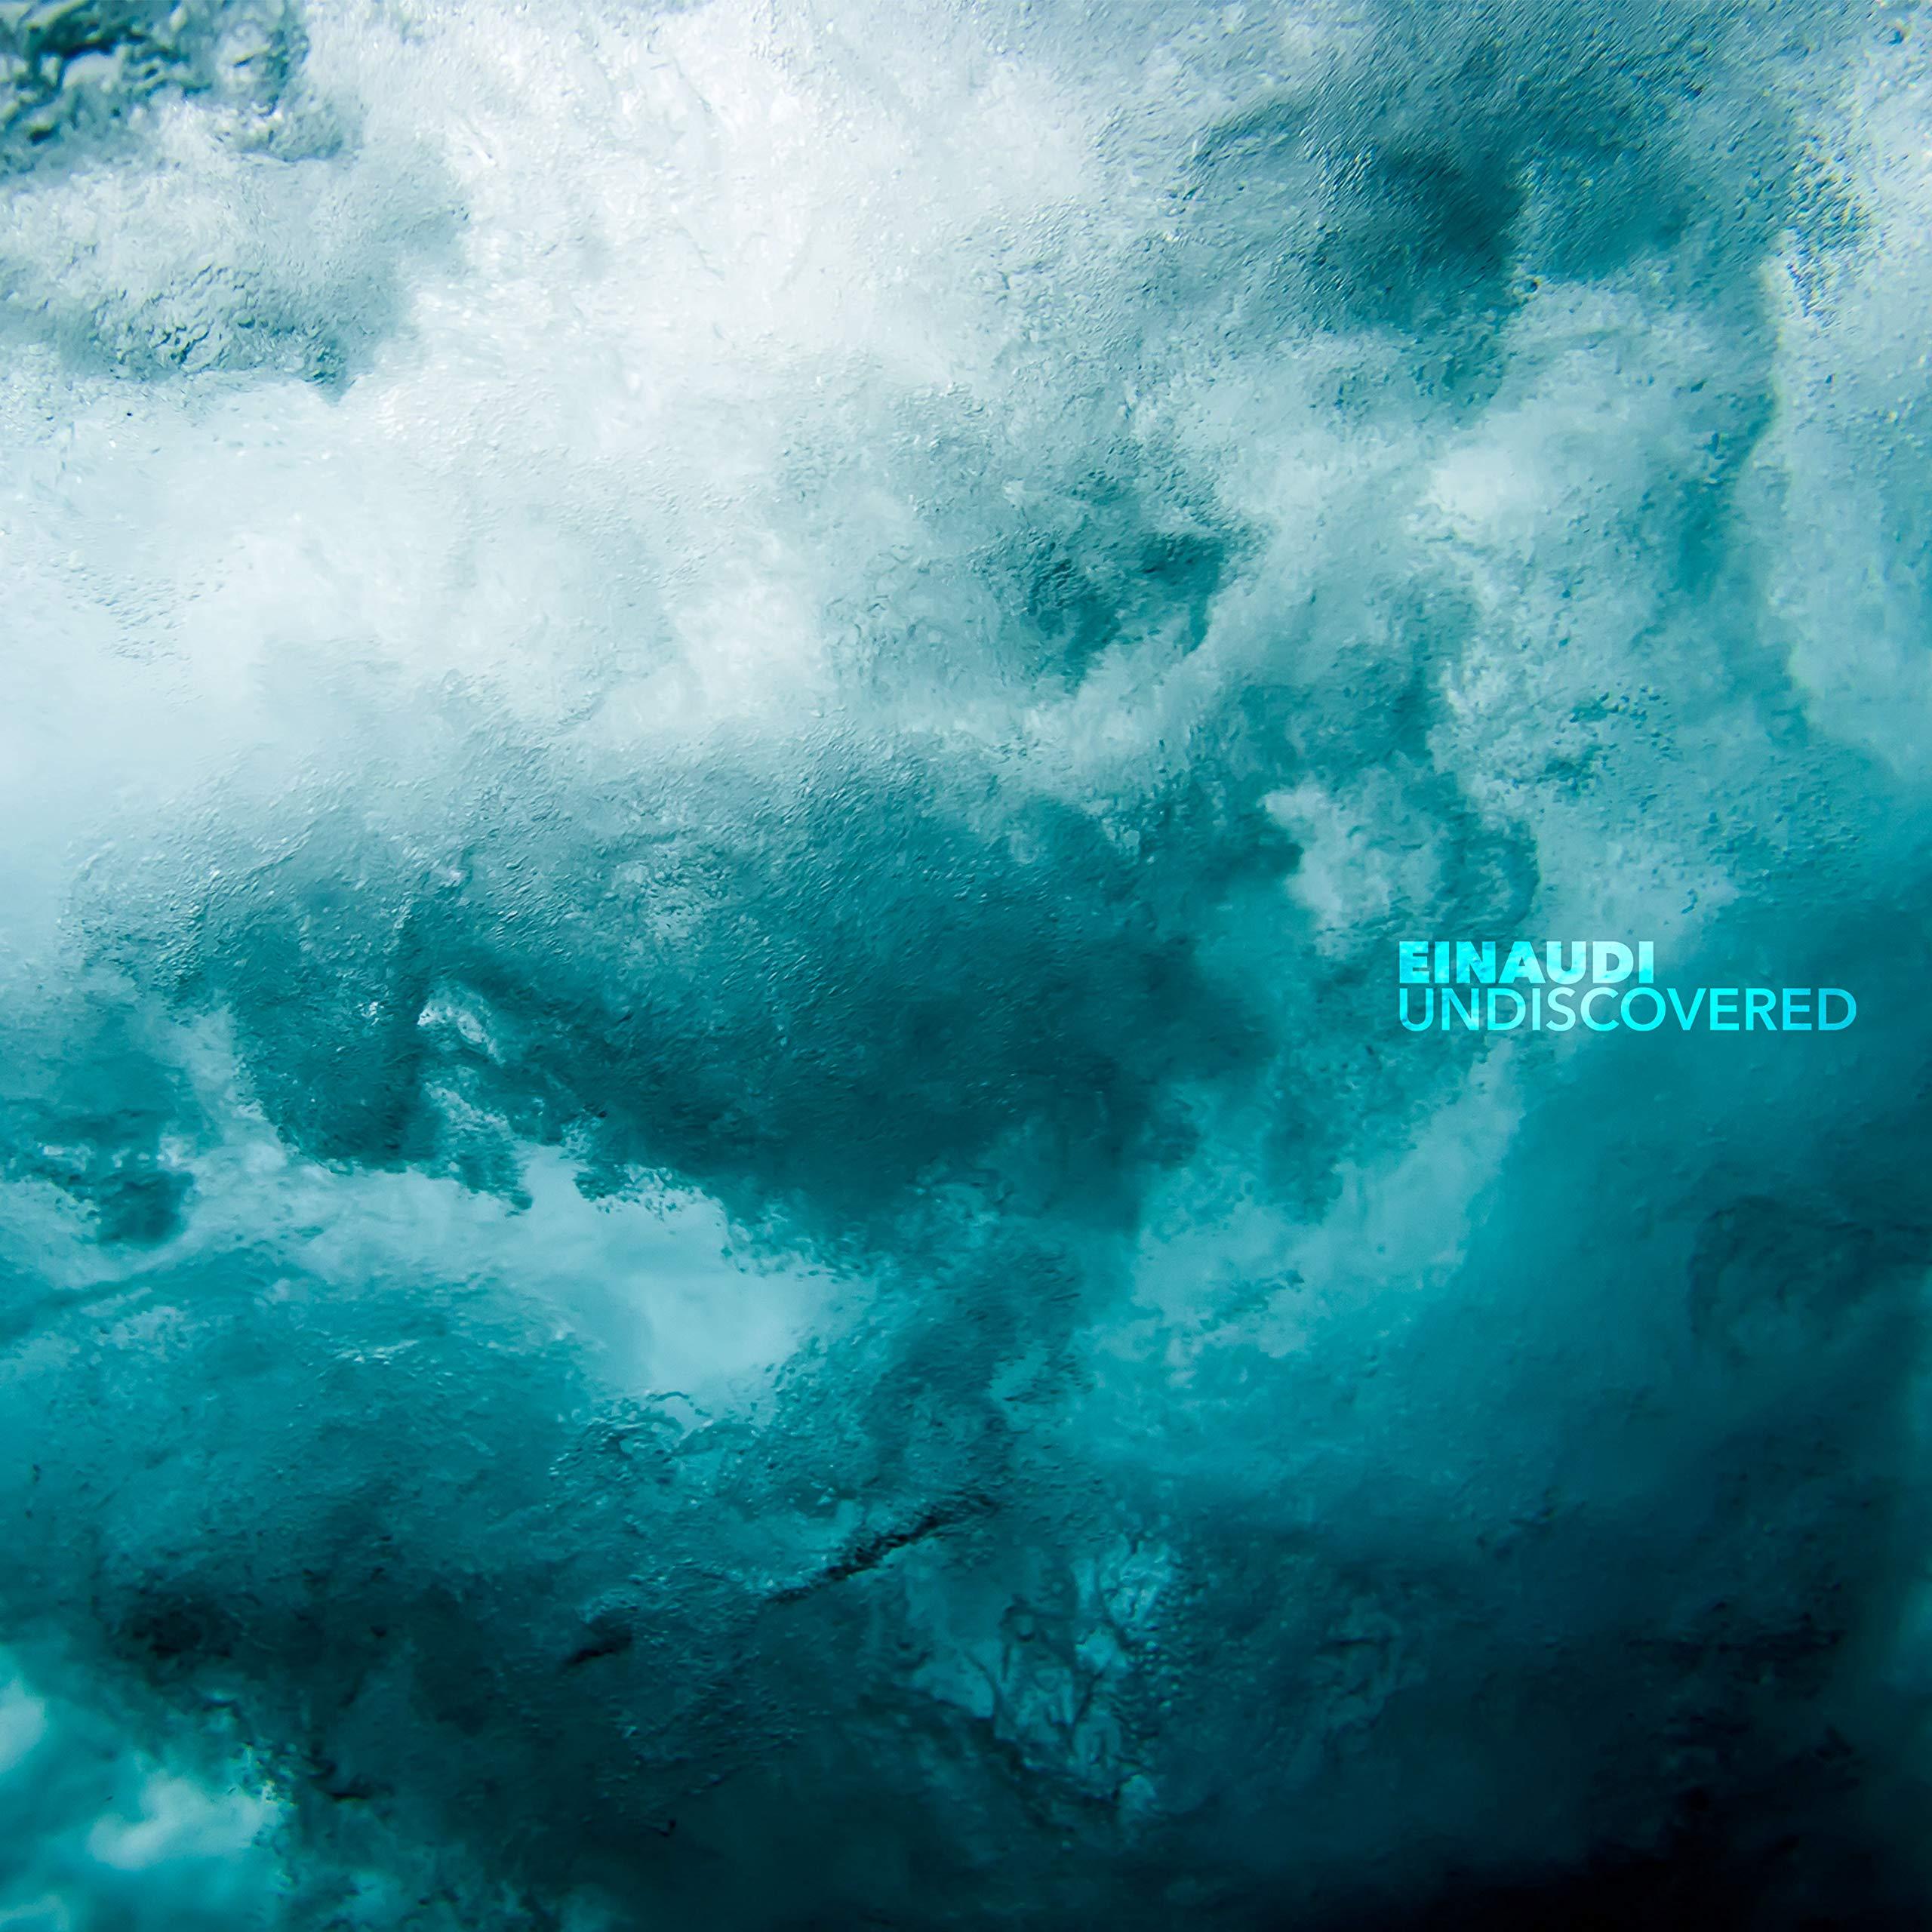 Ludovico Einaudi – Undiscovered (2020) [FLAC]